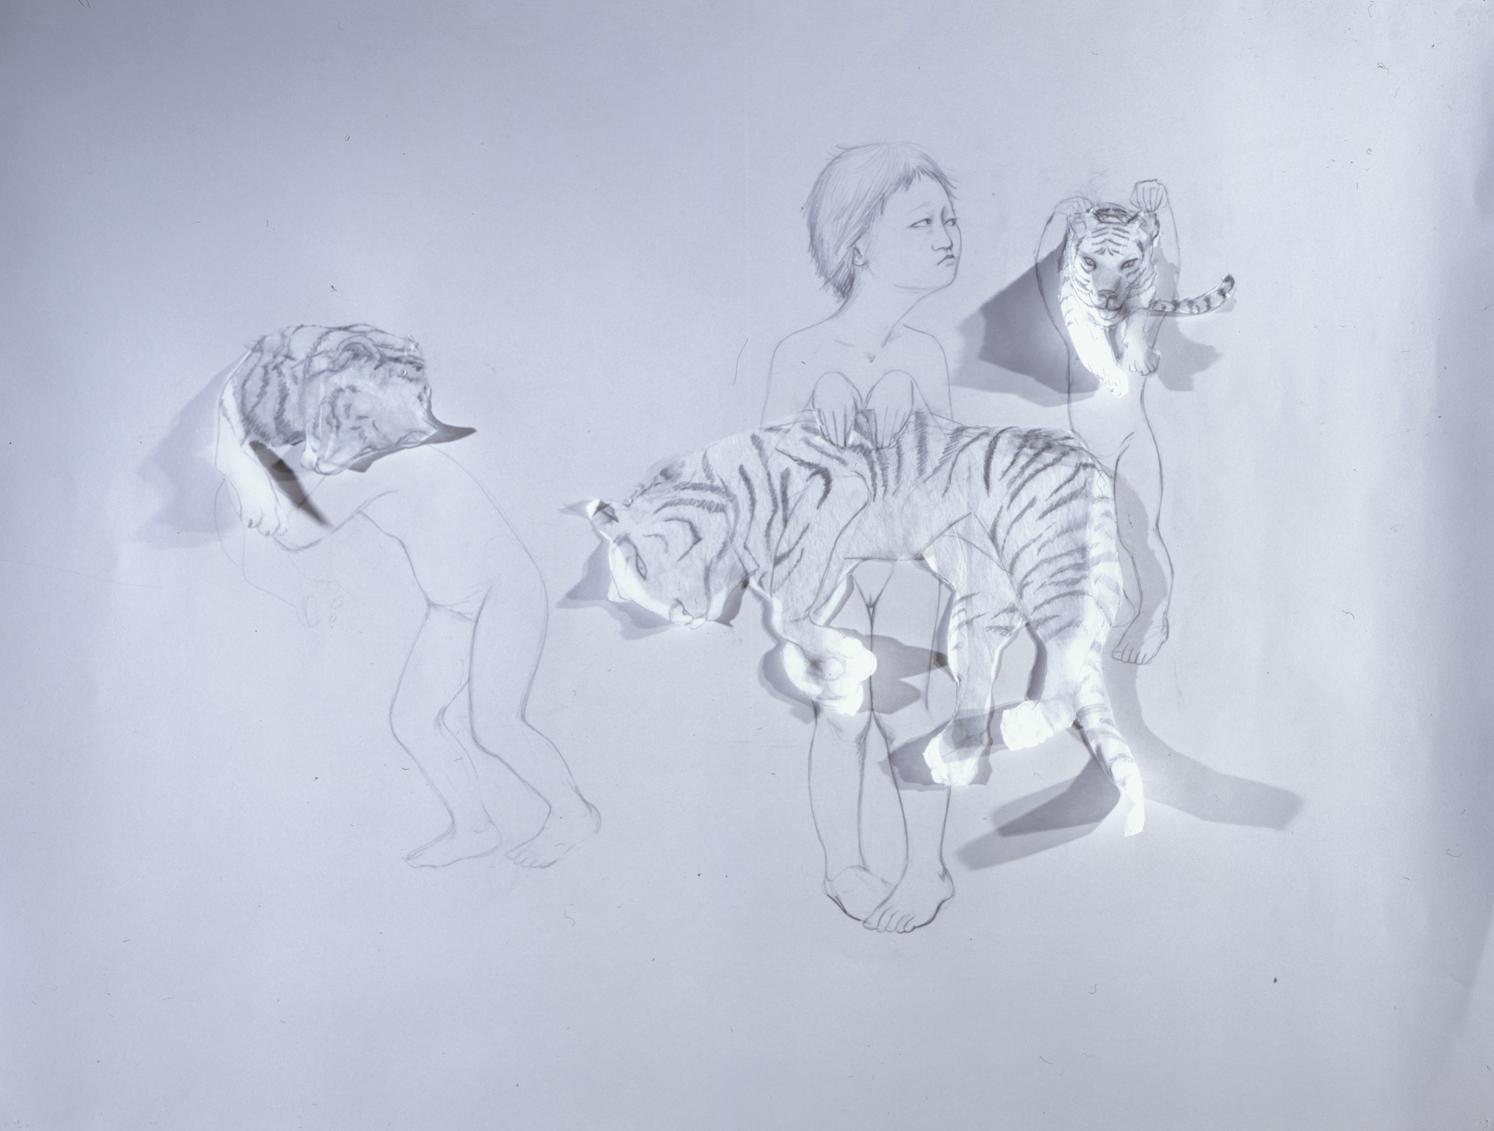 Paper Tigers , 2004 Graphite, kozo on gray paper 38 X 50 inches